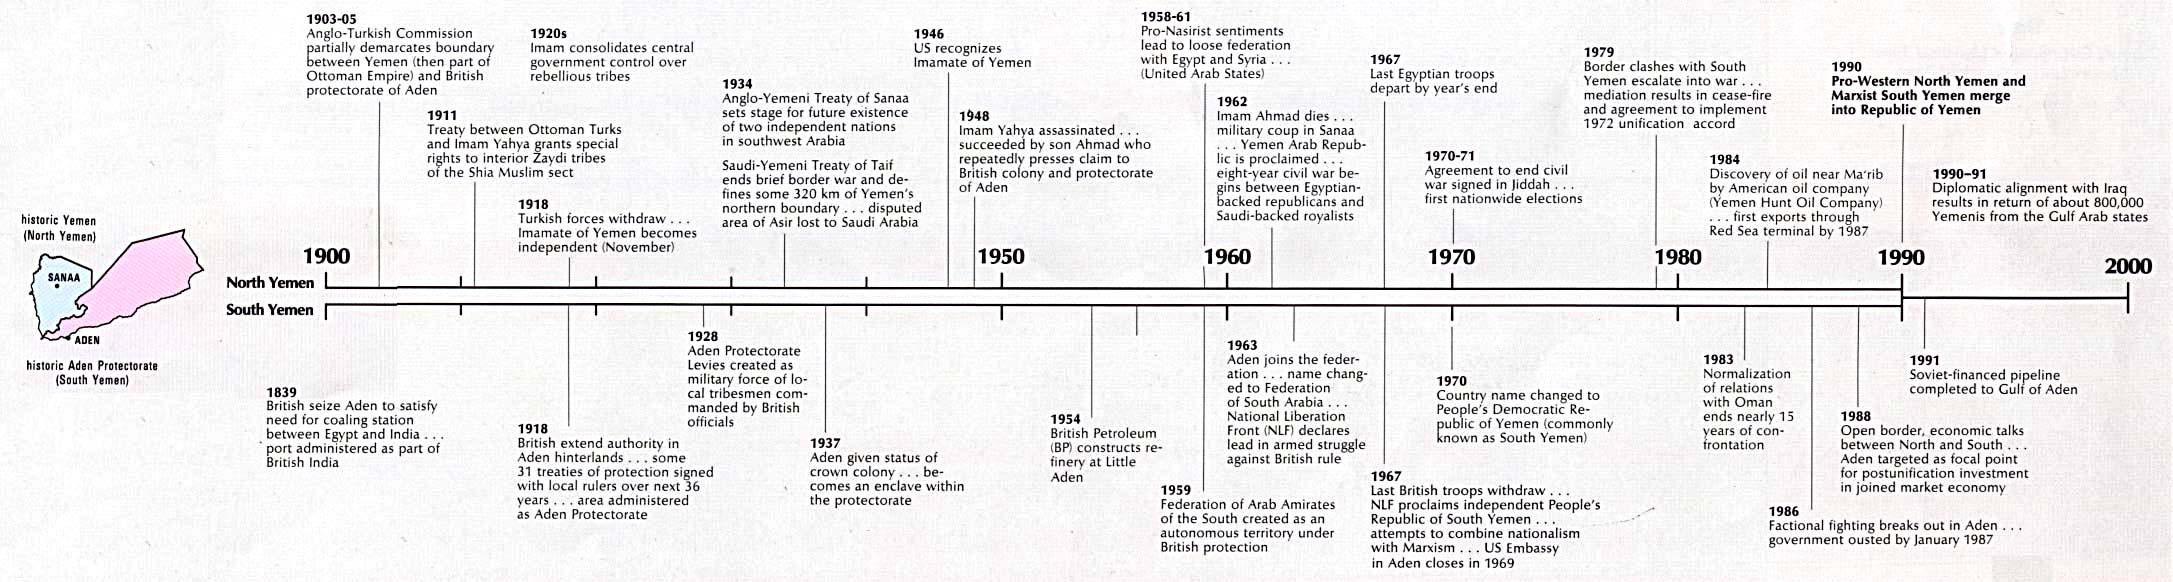 Timeline of Australian history - Wikipedia, the free encyclopedia